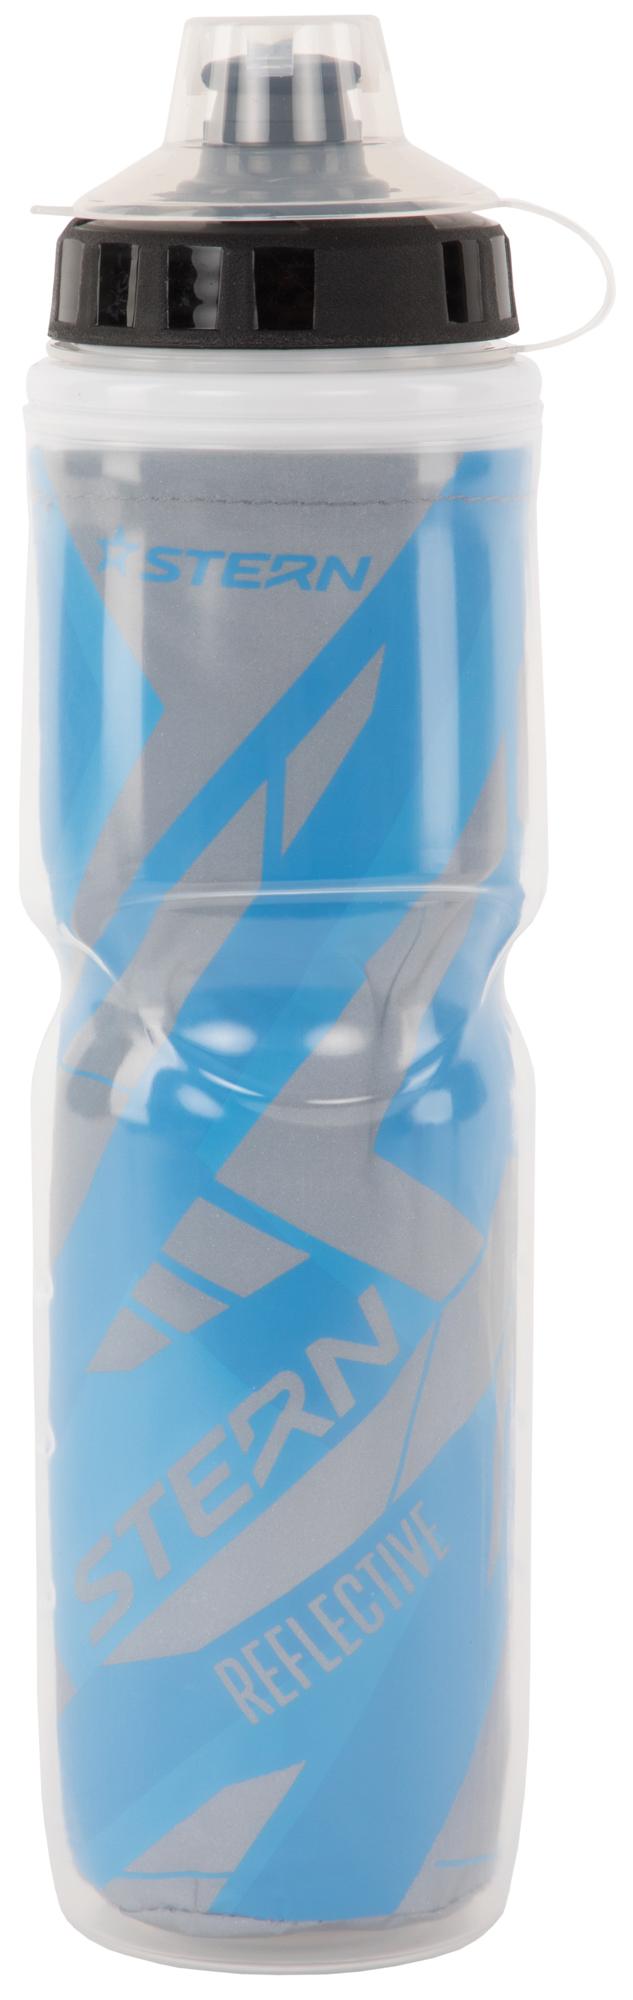 цена на Stern Фляжка для воды Stern